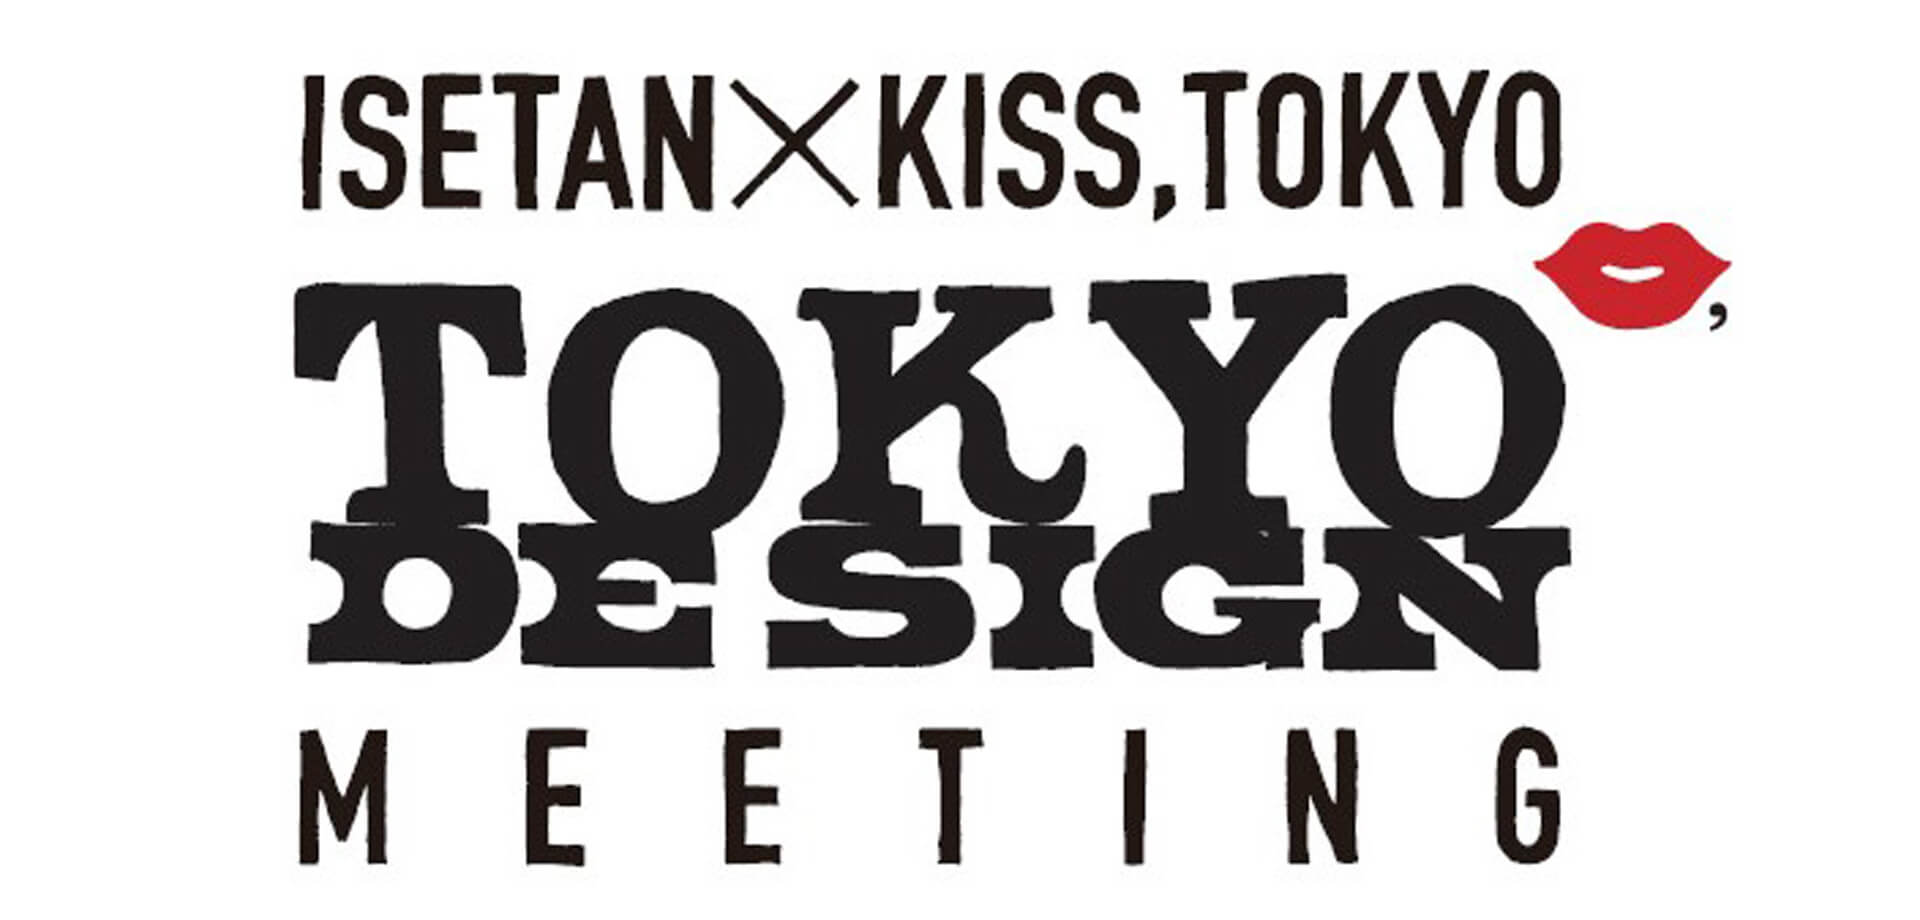 「ISETAN × KISS, TOKYO ~TOKYO DESIGN MEETING~」